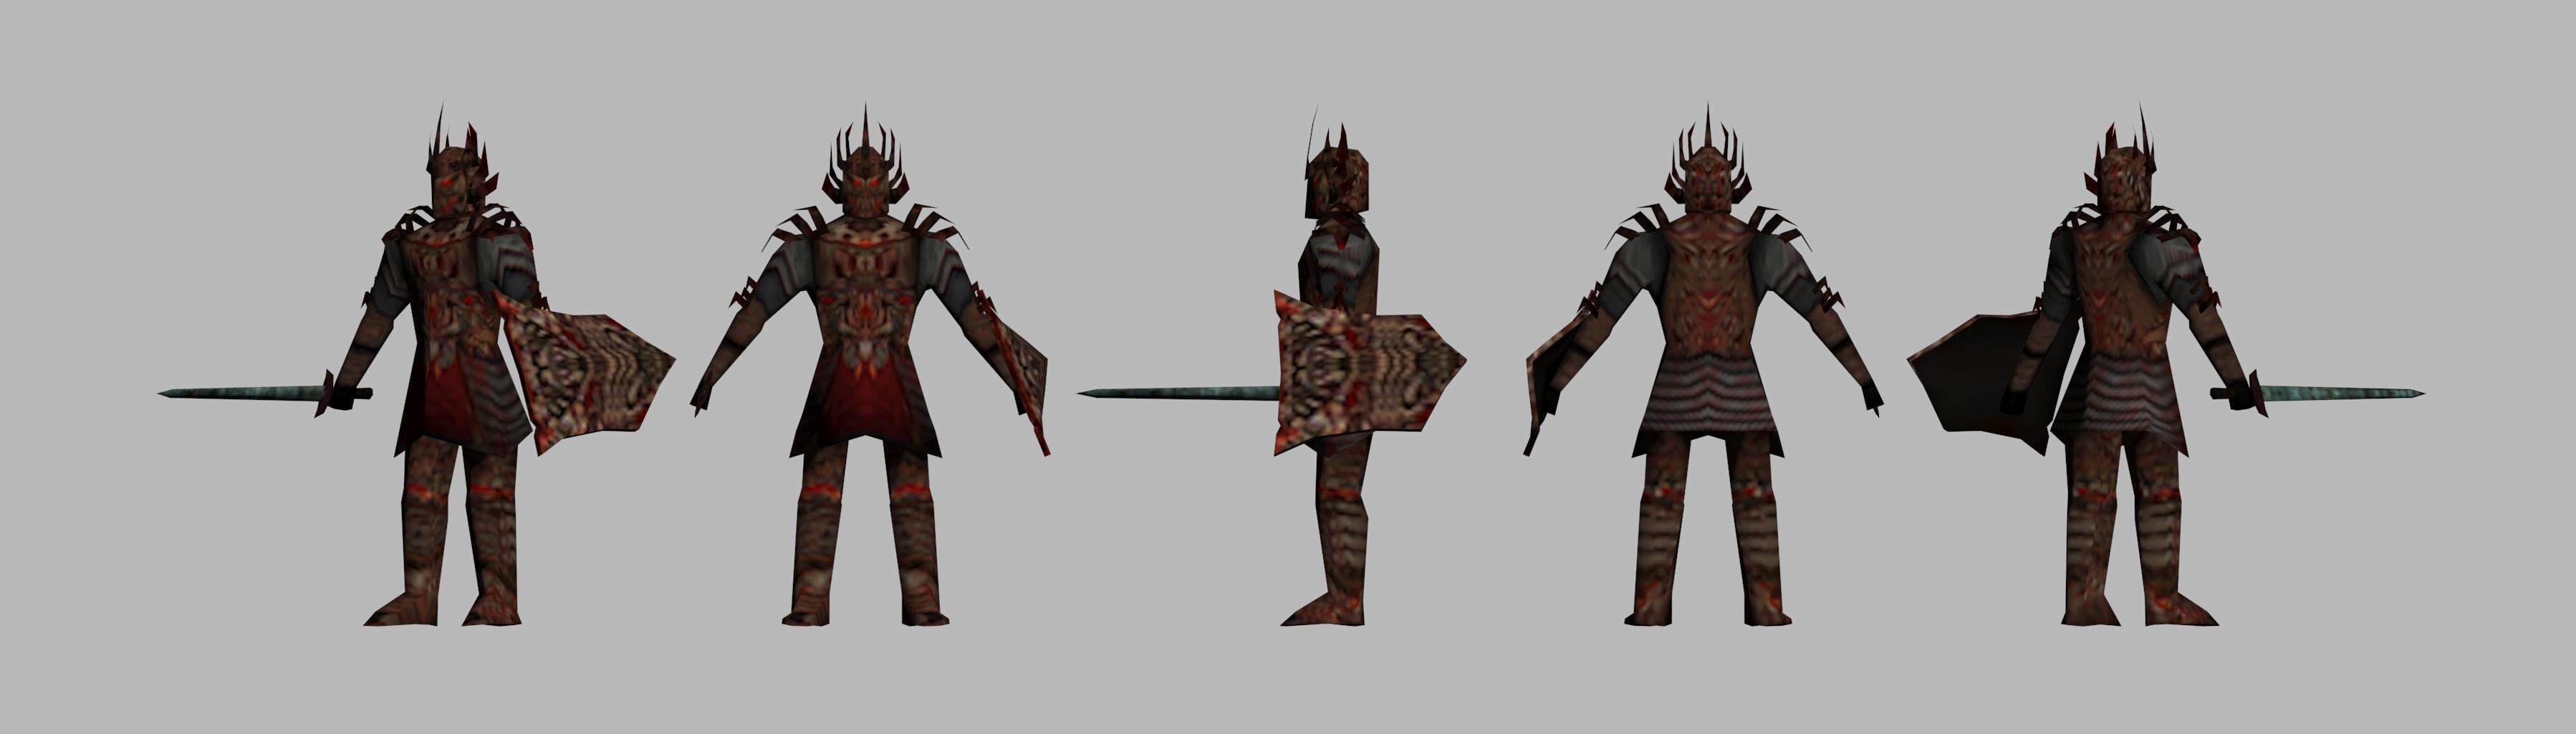 Oblivion mod - Page 2 Dremorawarrior